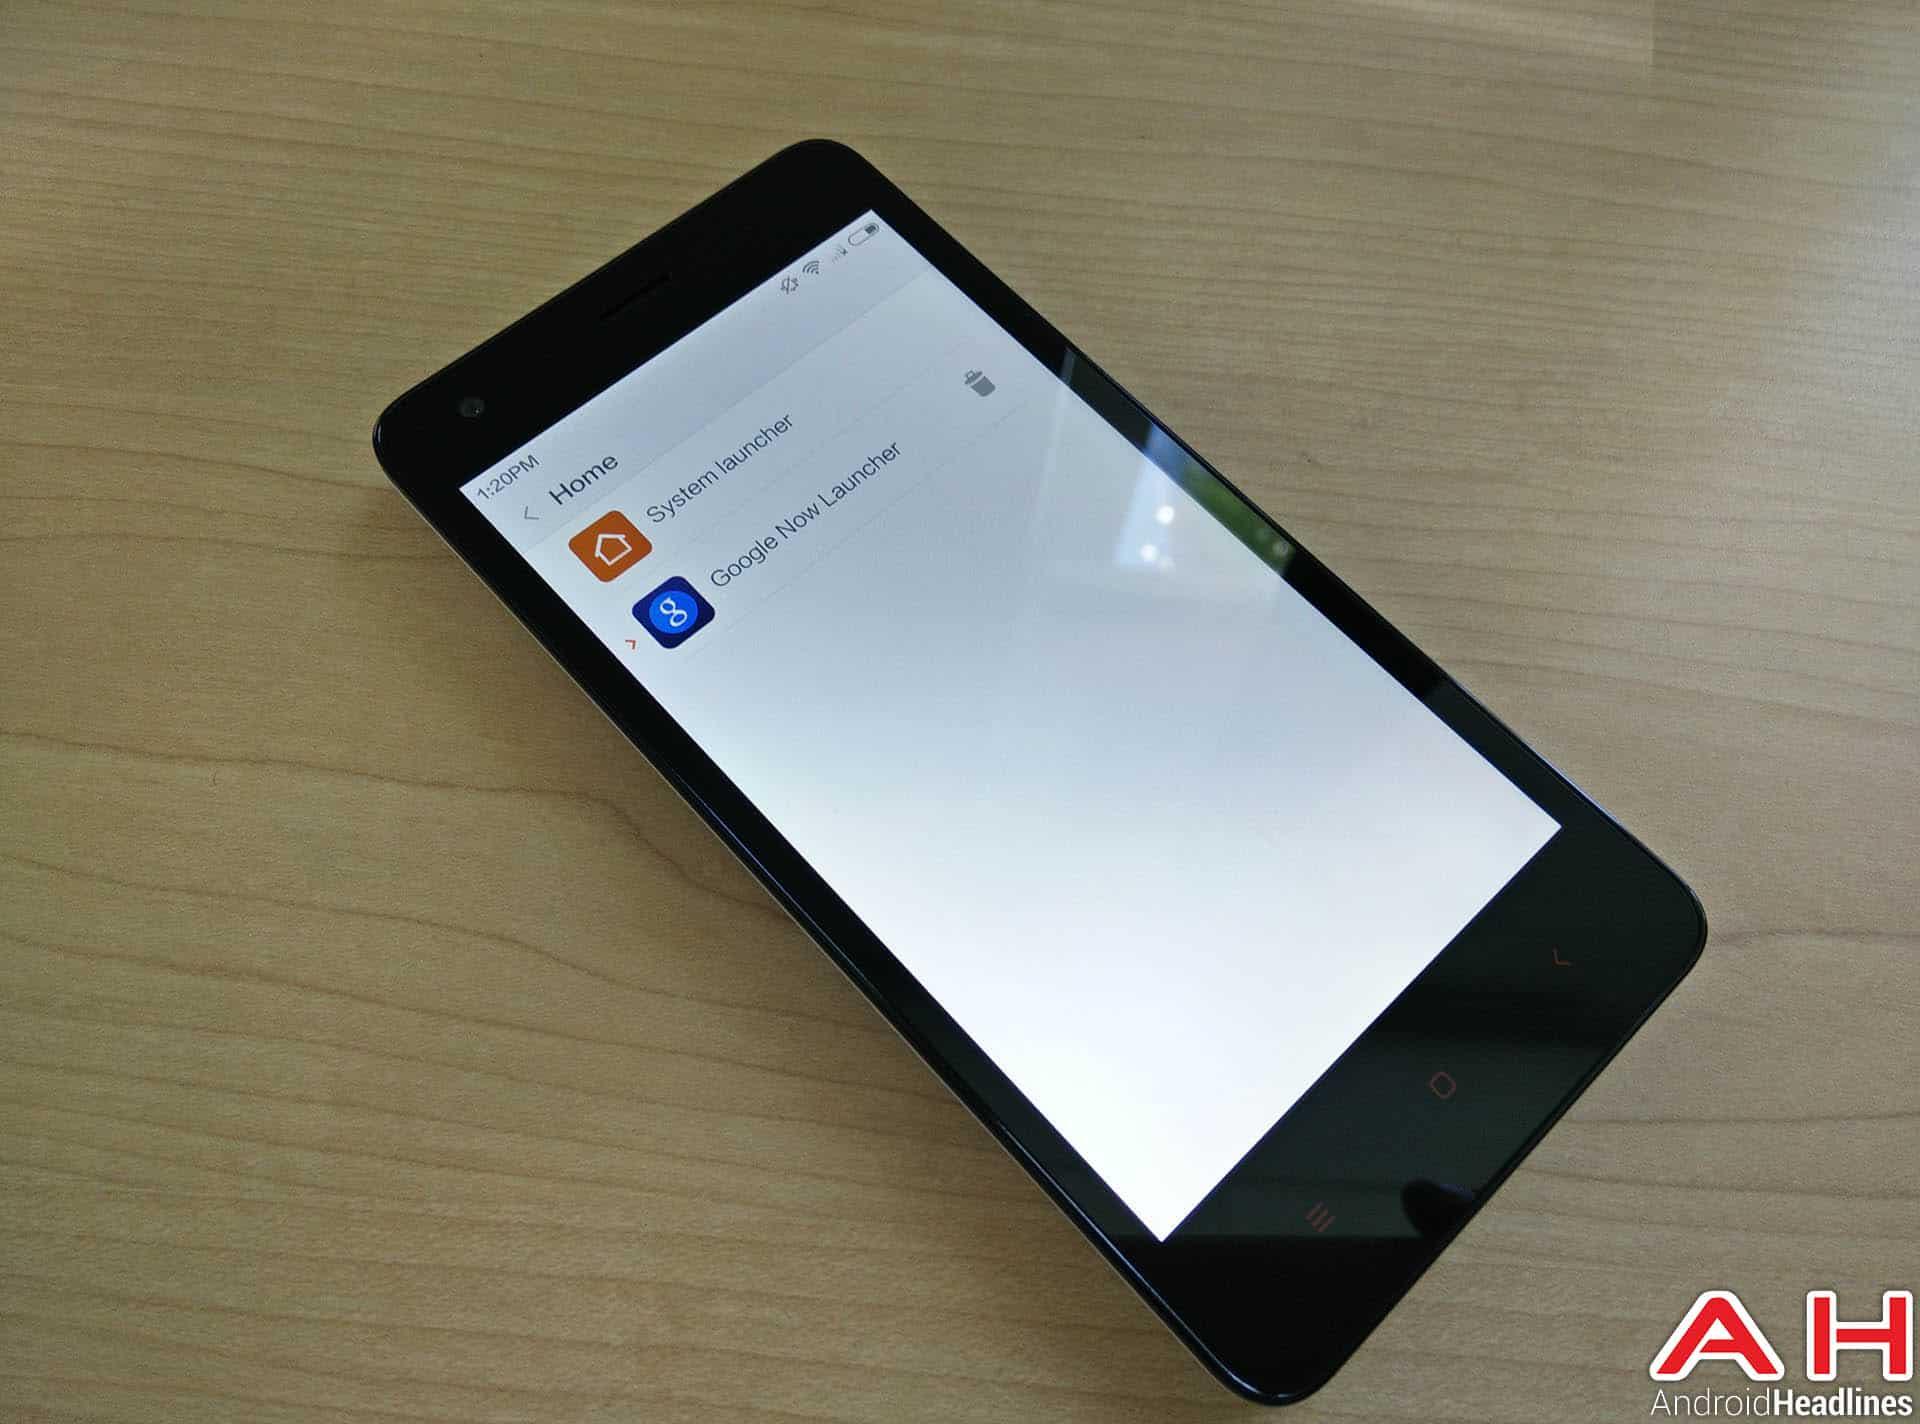 Xiaomi-MIUI-Google-Now-Launcher-3a